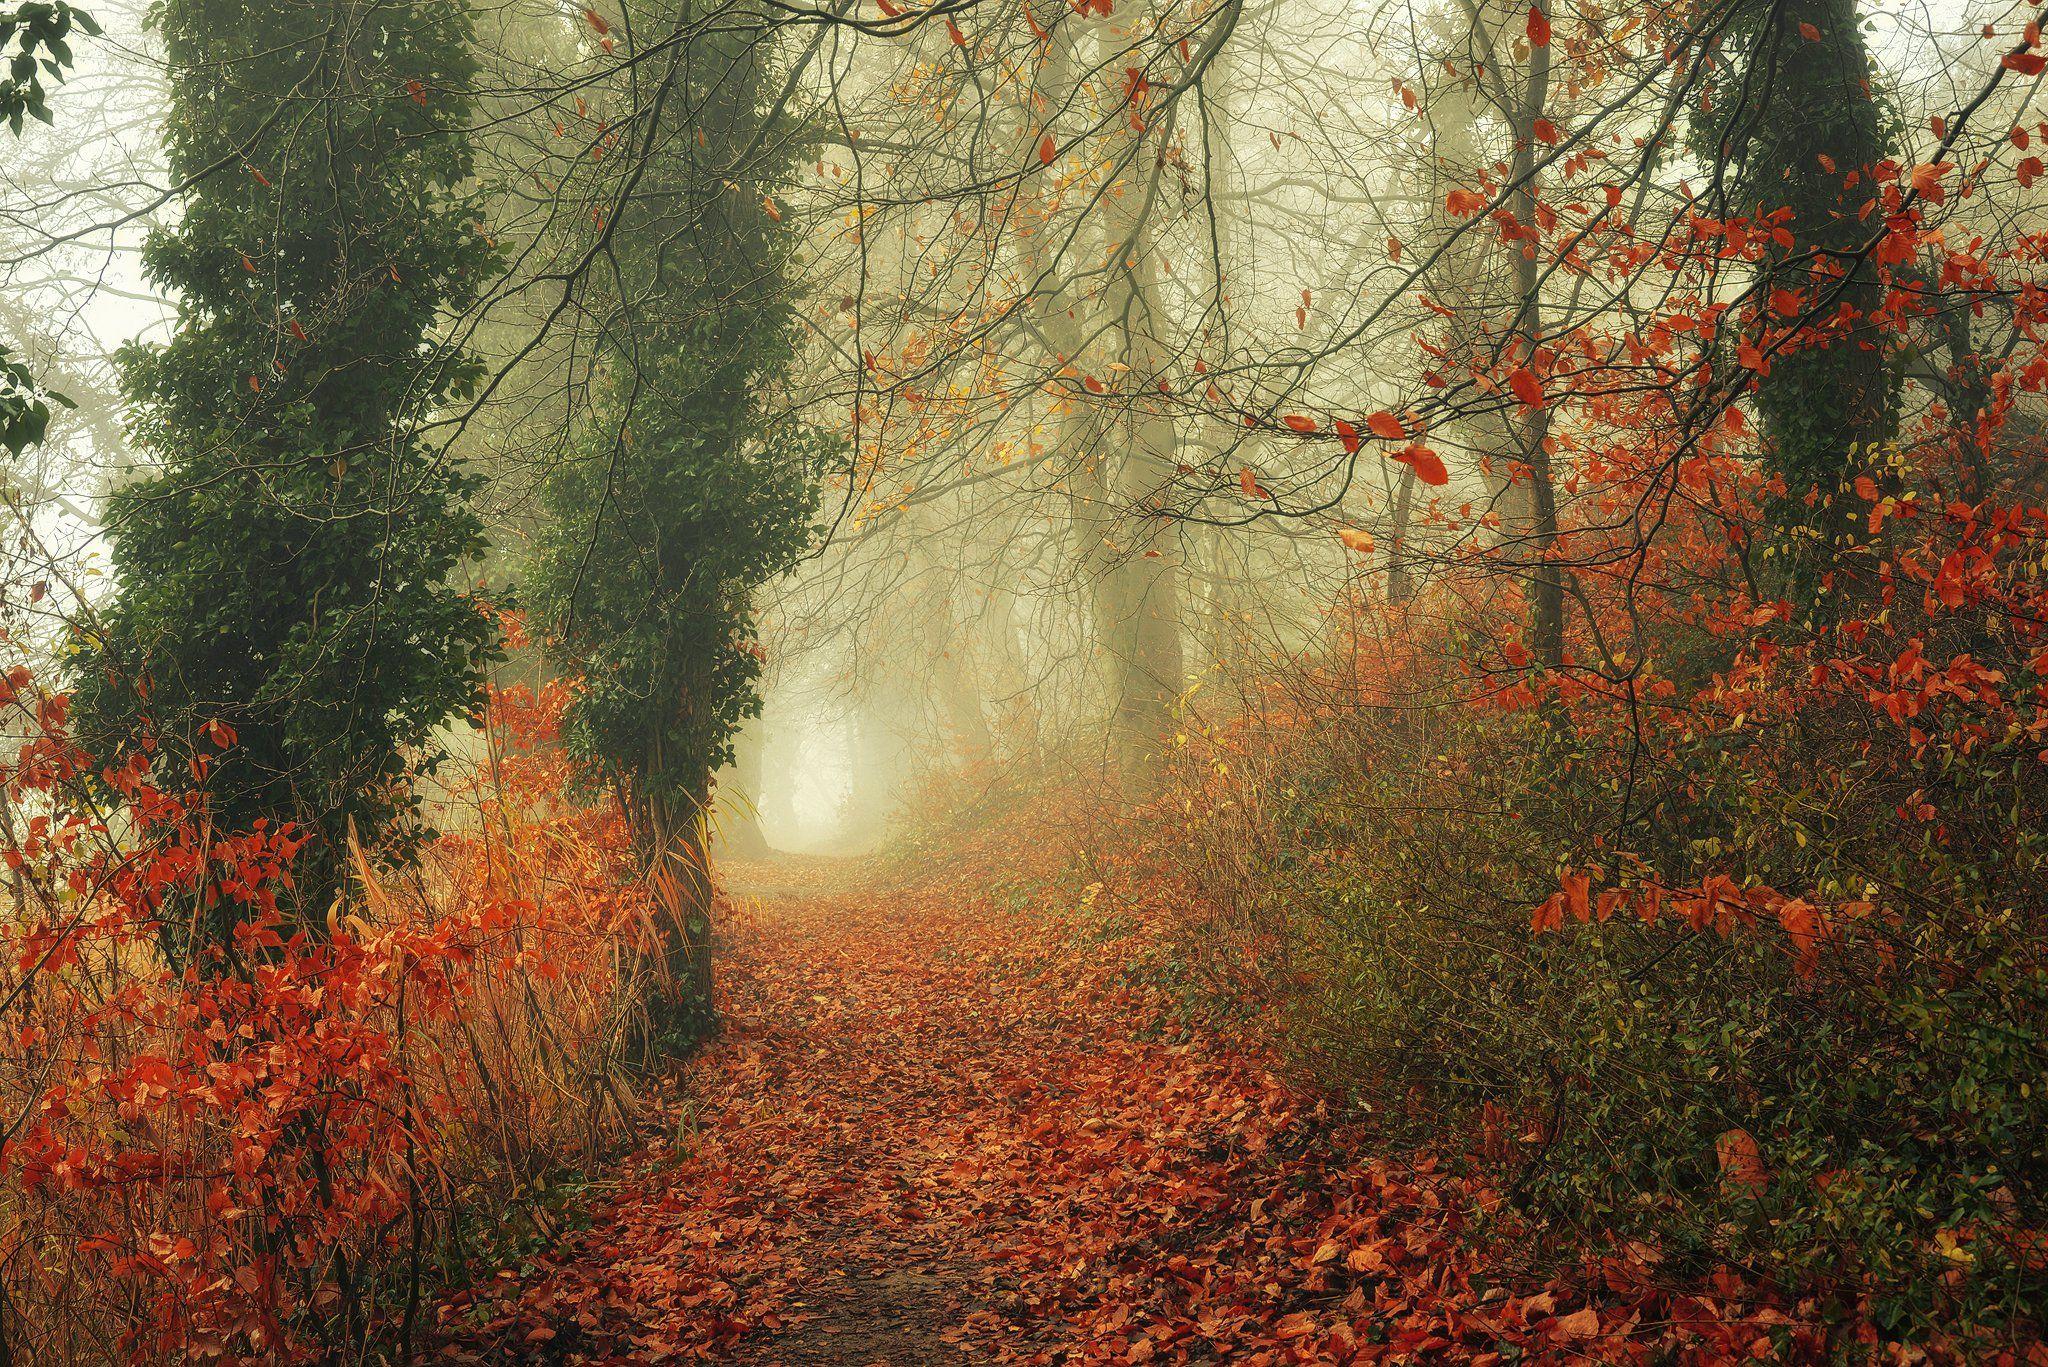 осенняя тропа autumn path misty fall trees magic mist foggy road dranikowski leaves, Radoslaw Dranikowski